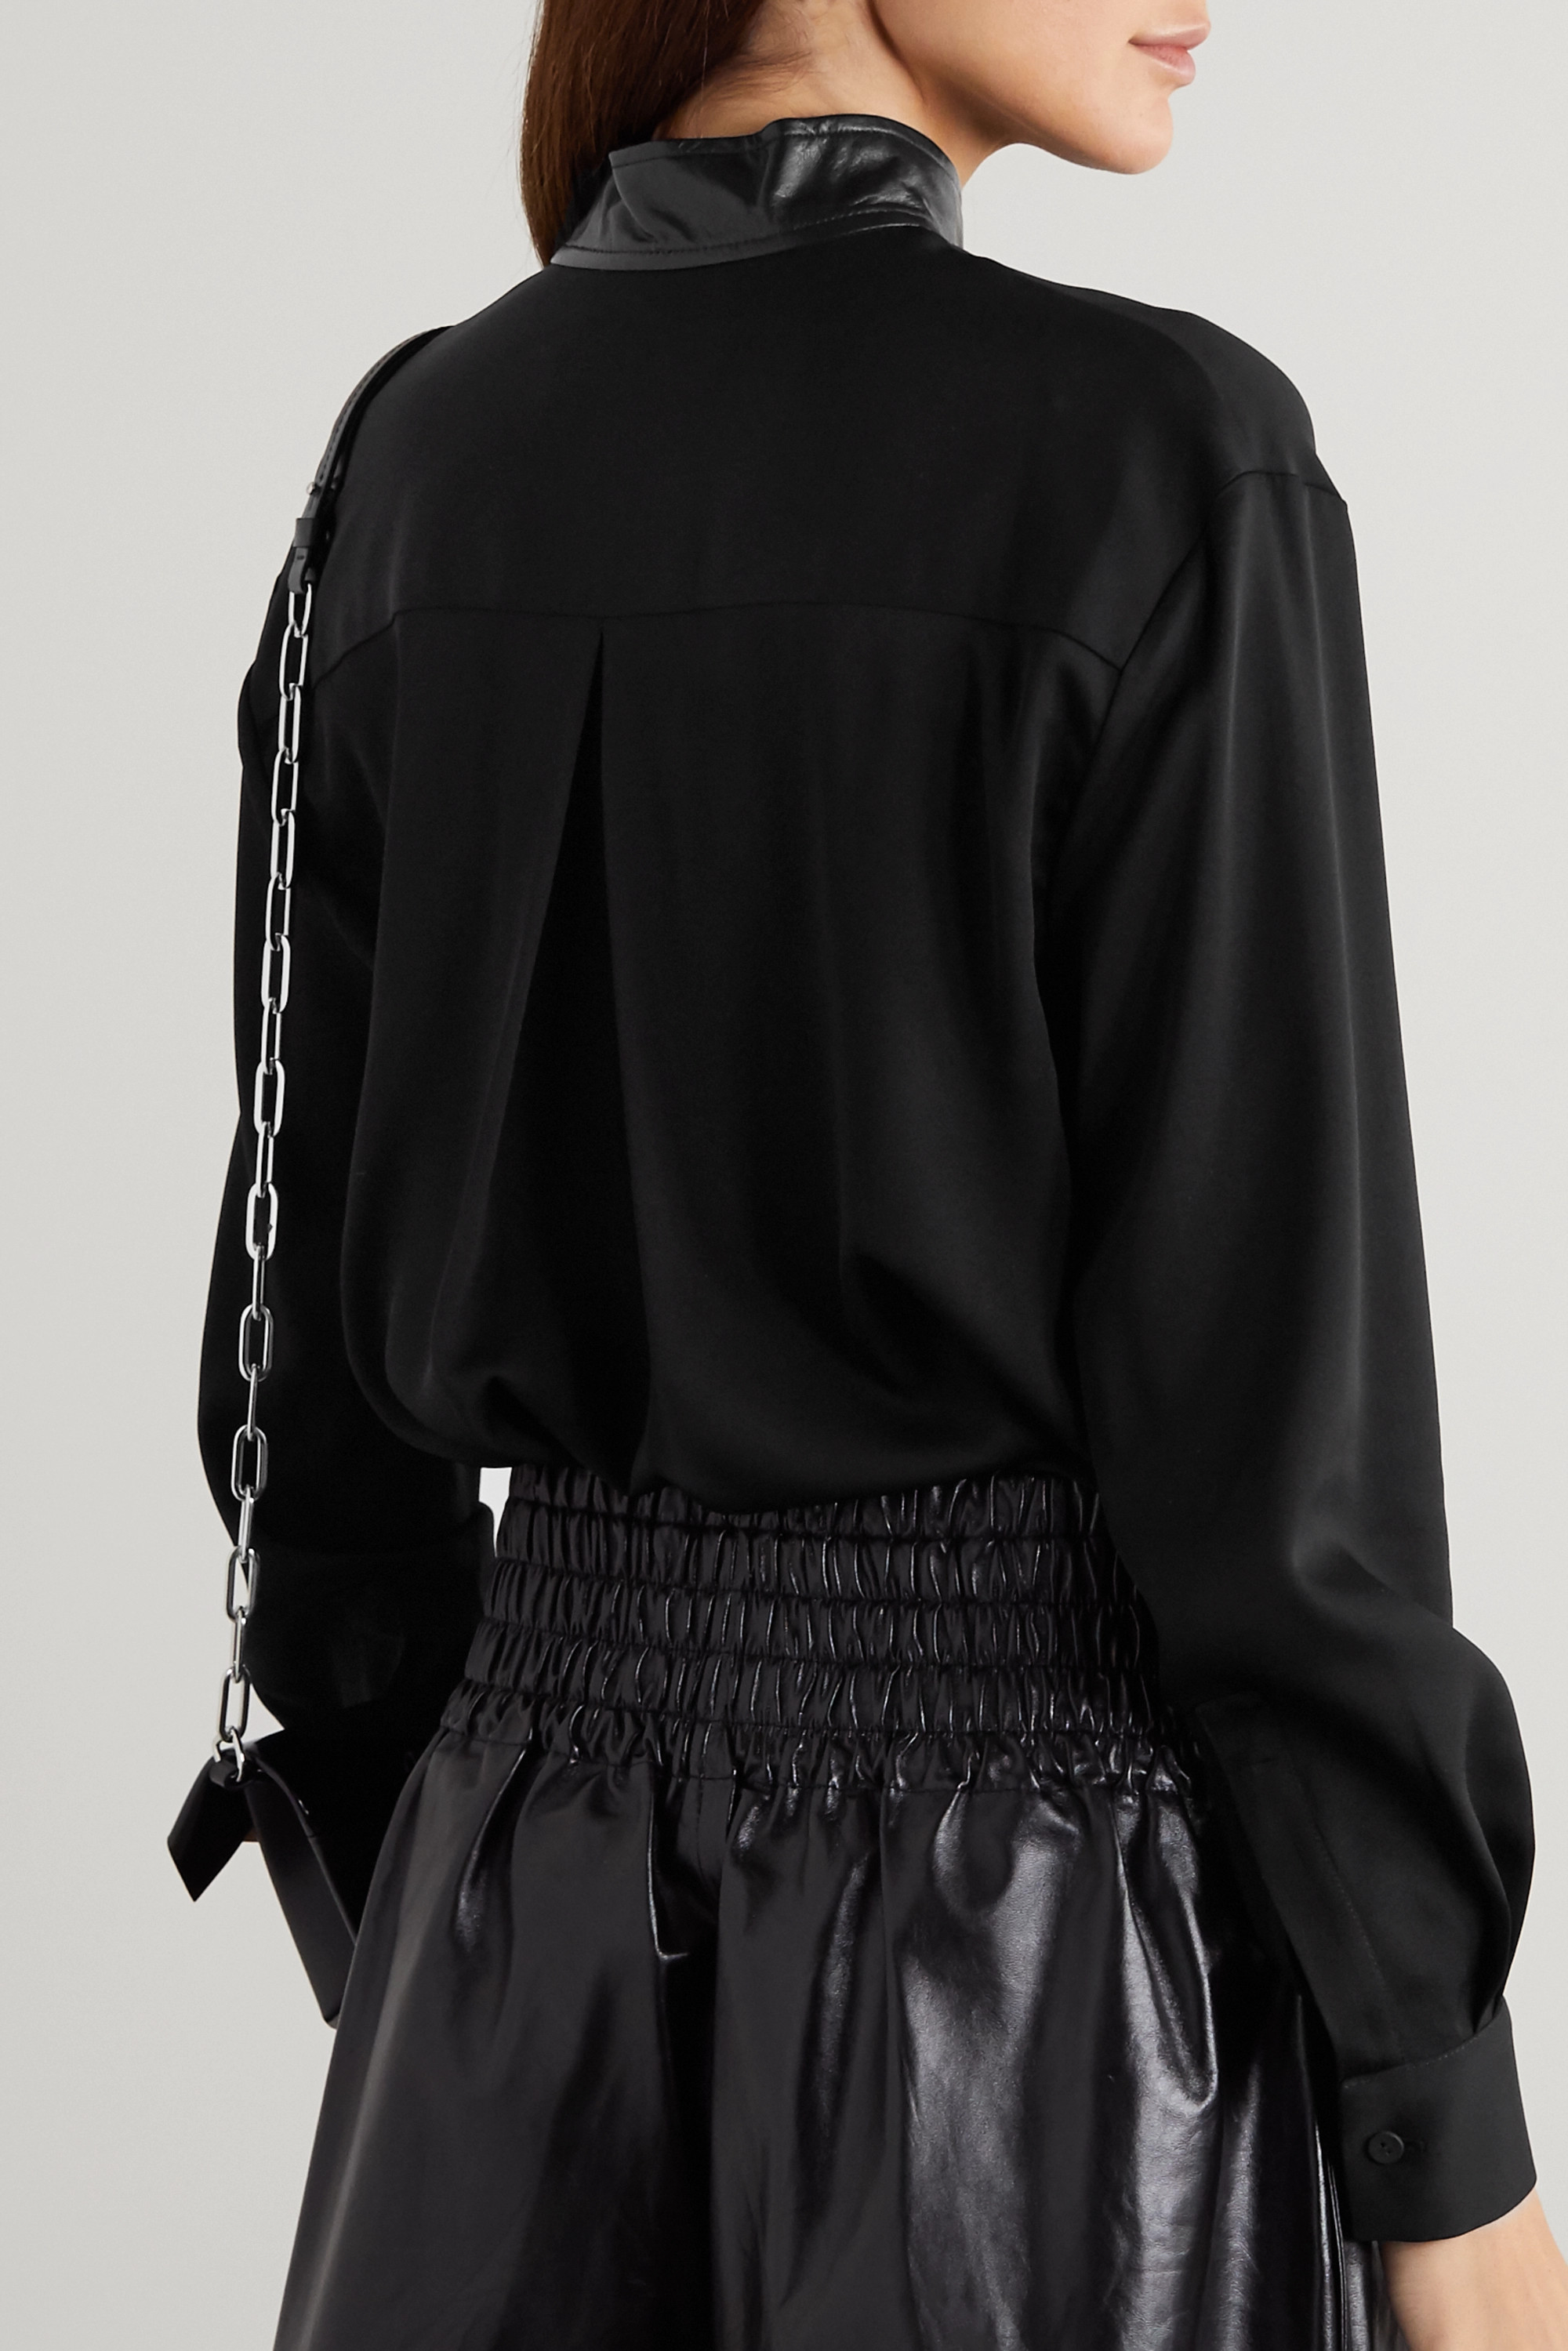 Christopher Esber Leather-trimmed voile blouse